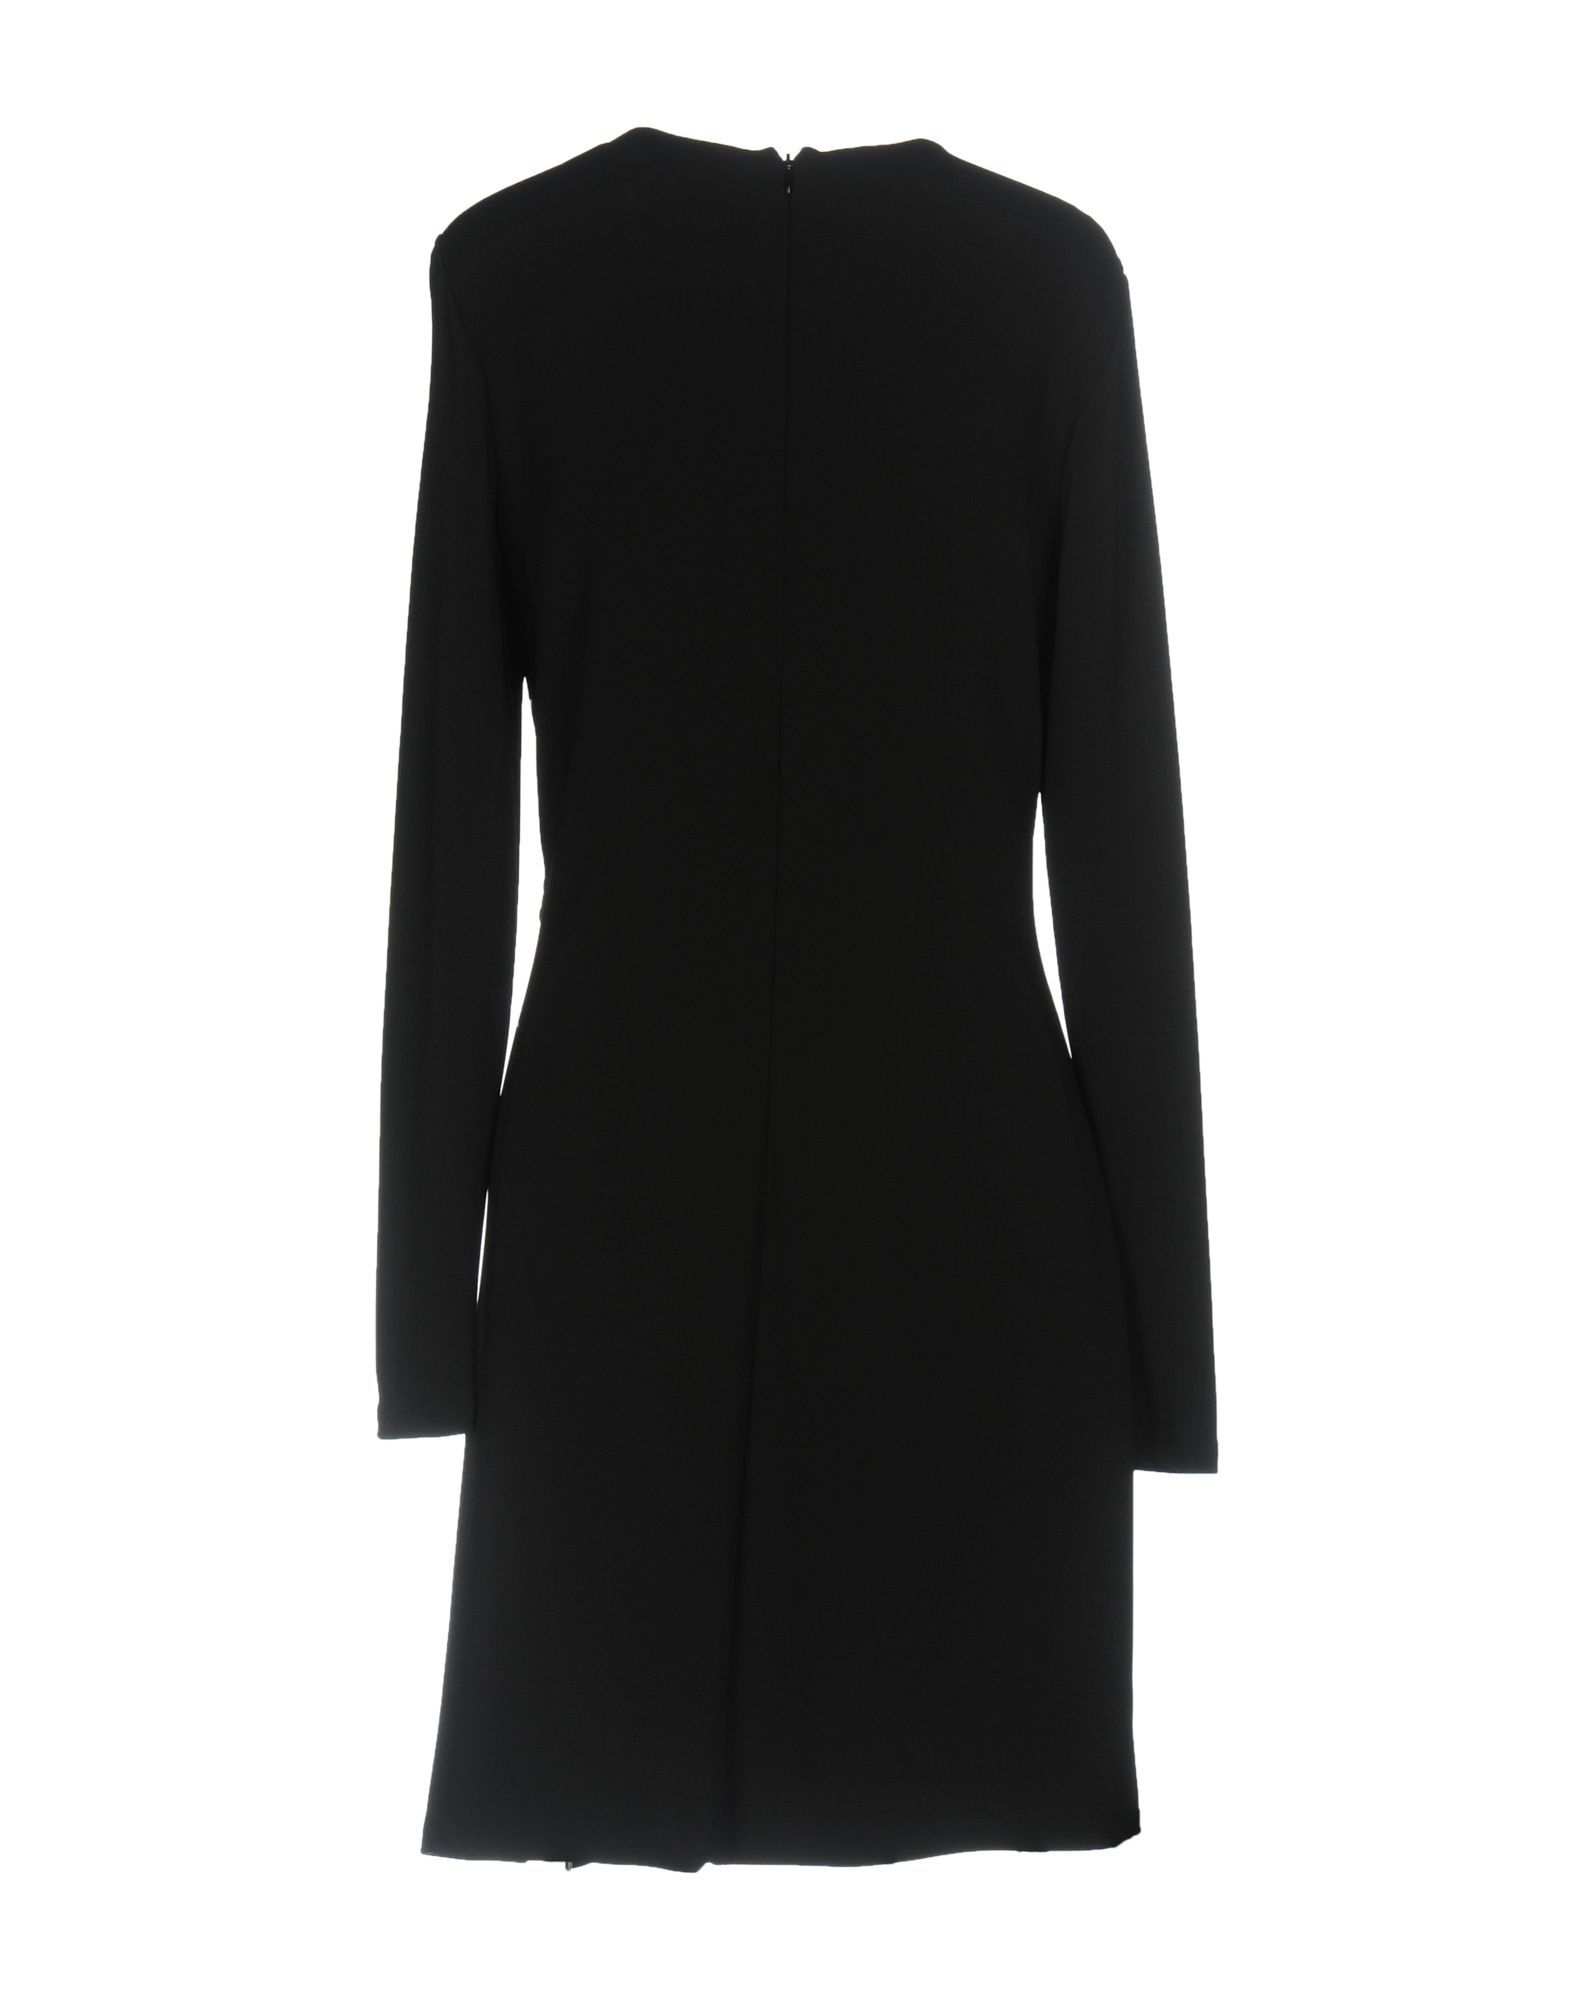 DRESSES Emilio Pucci Black Woman Viscose